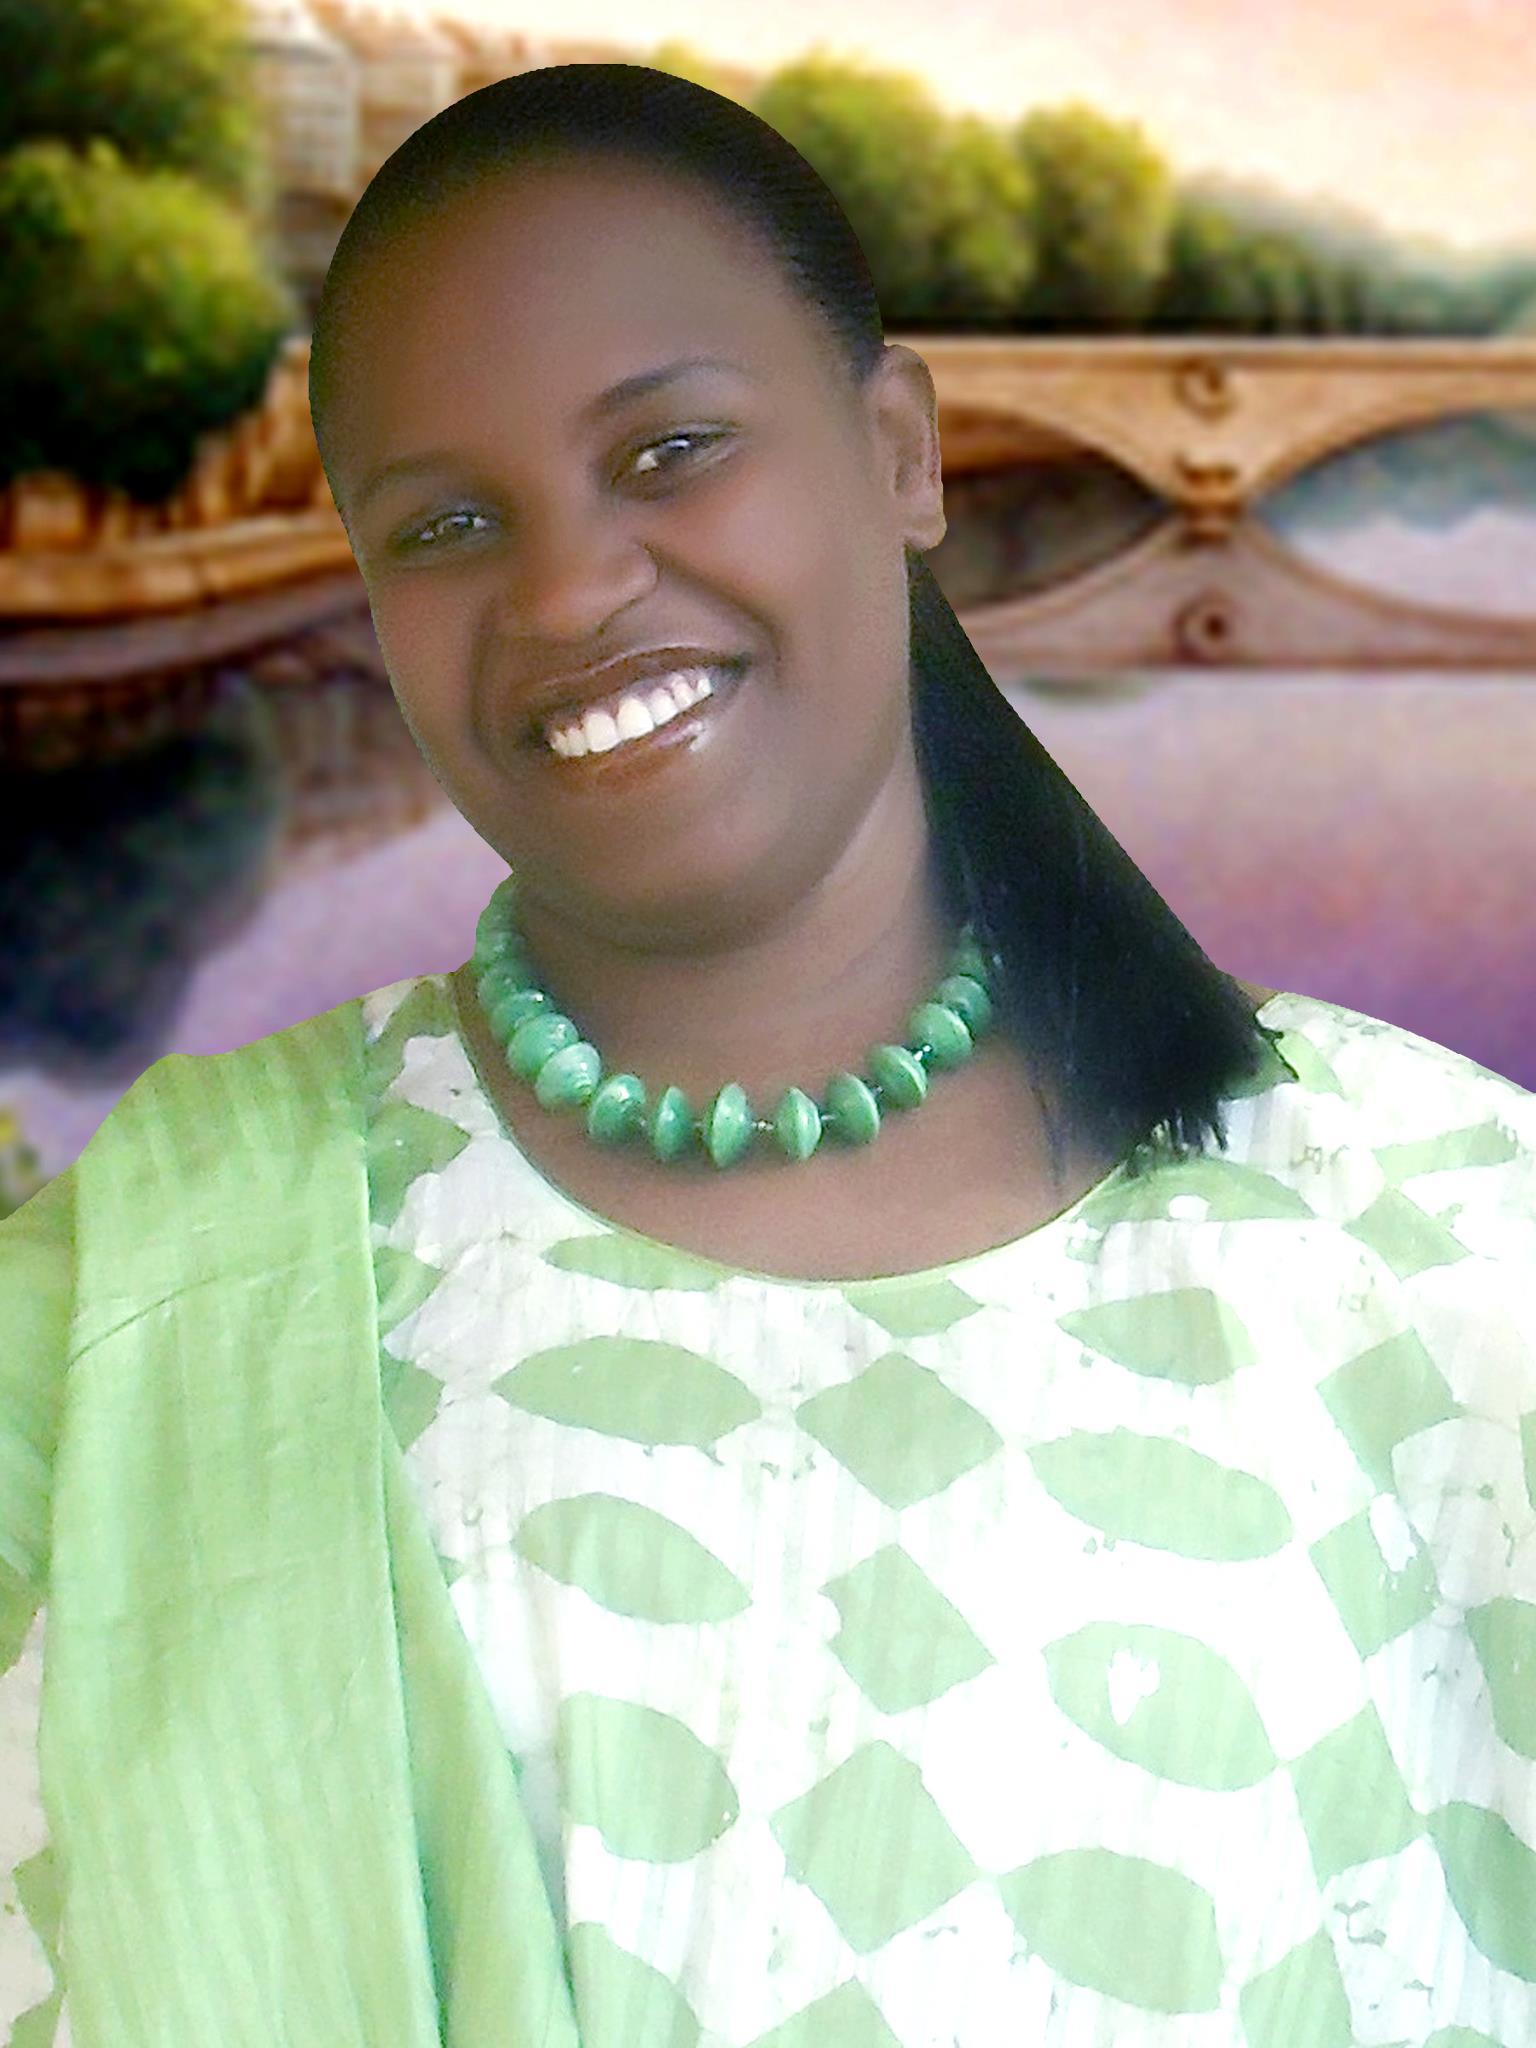 Jeunesse rwandaise, jeunesse engagée ?